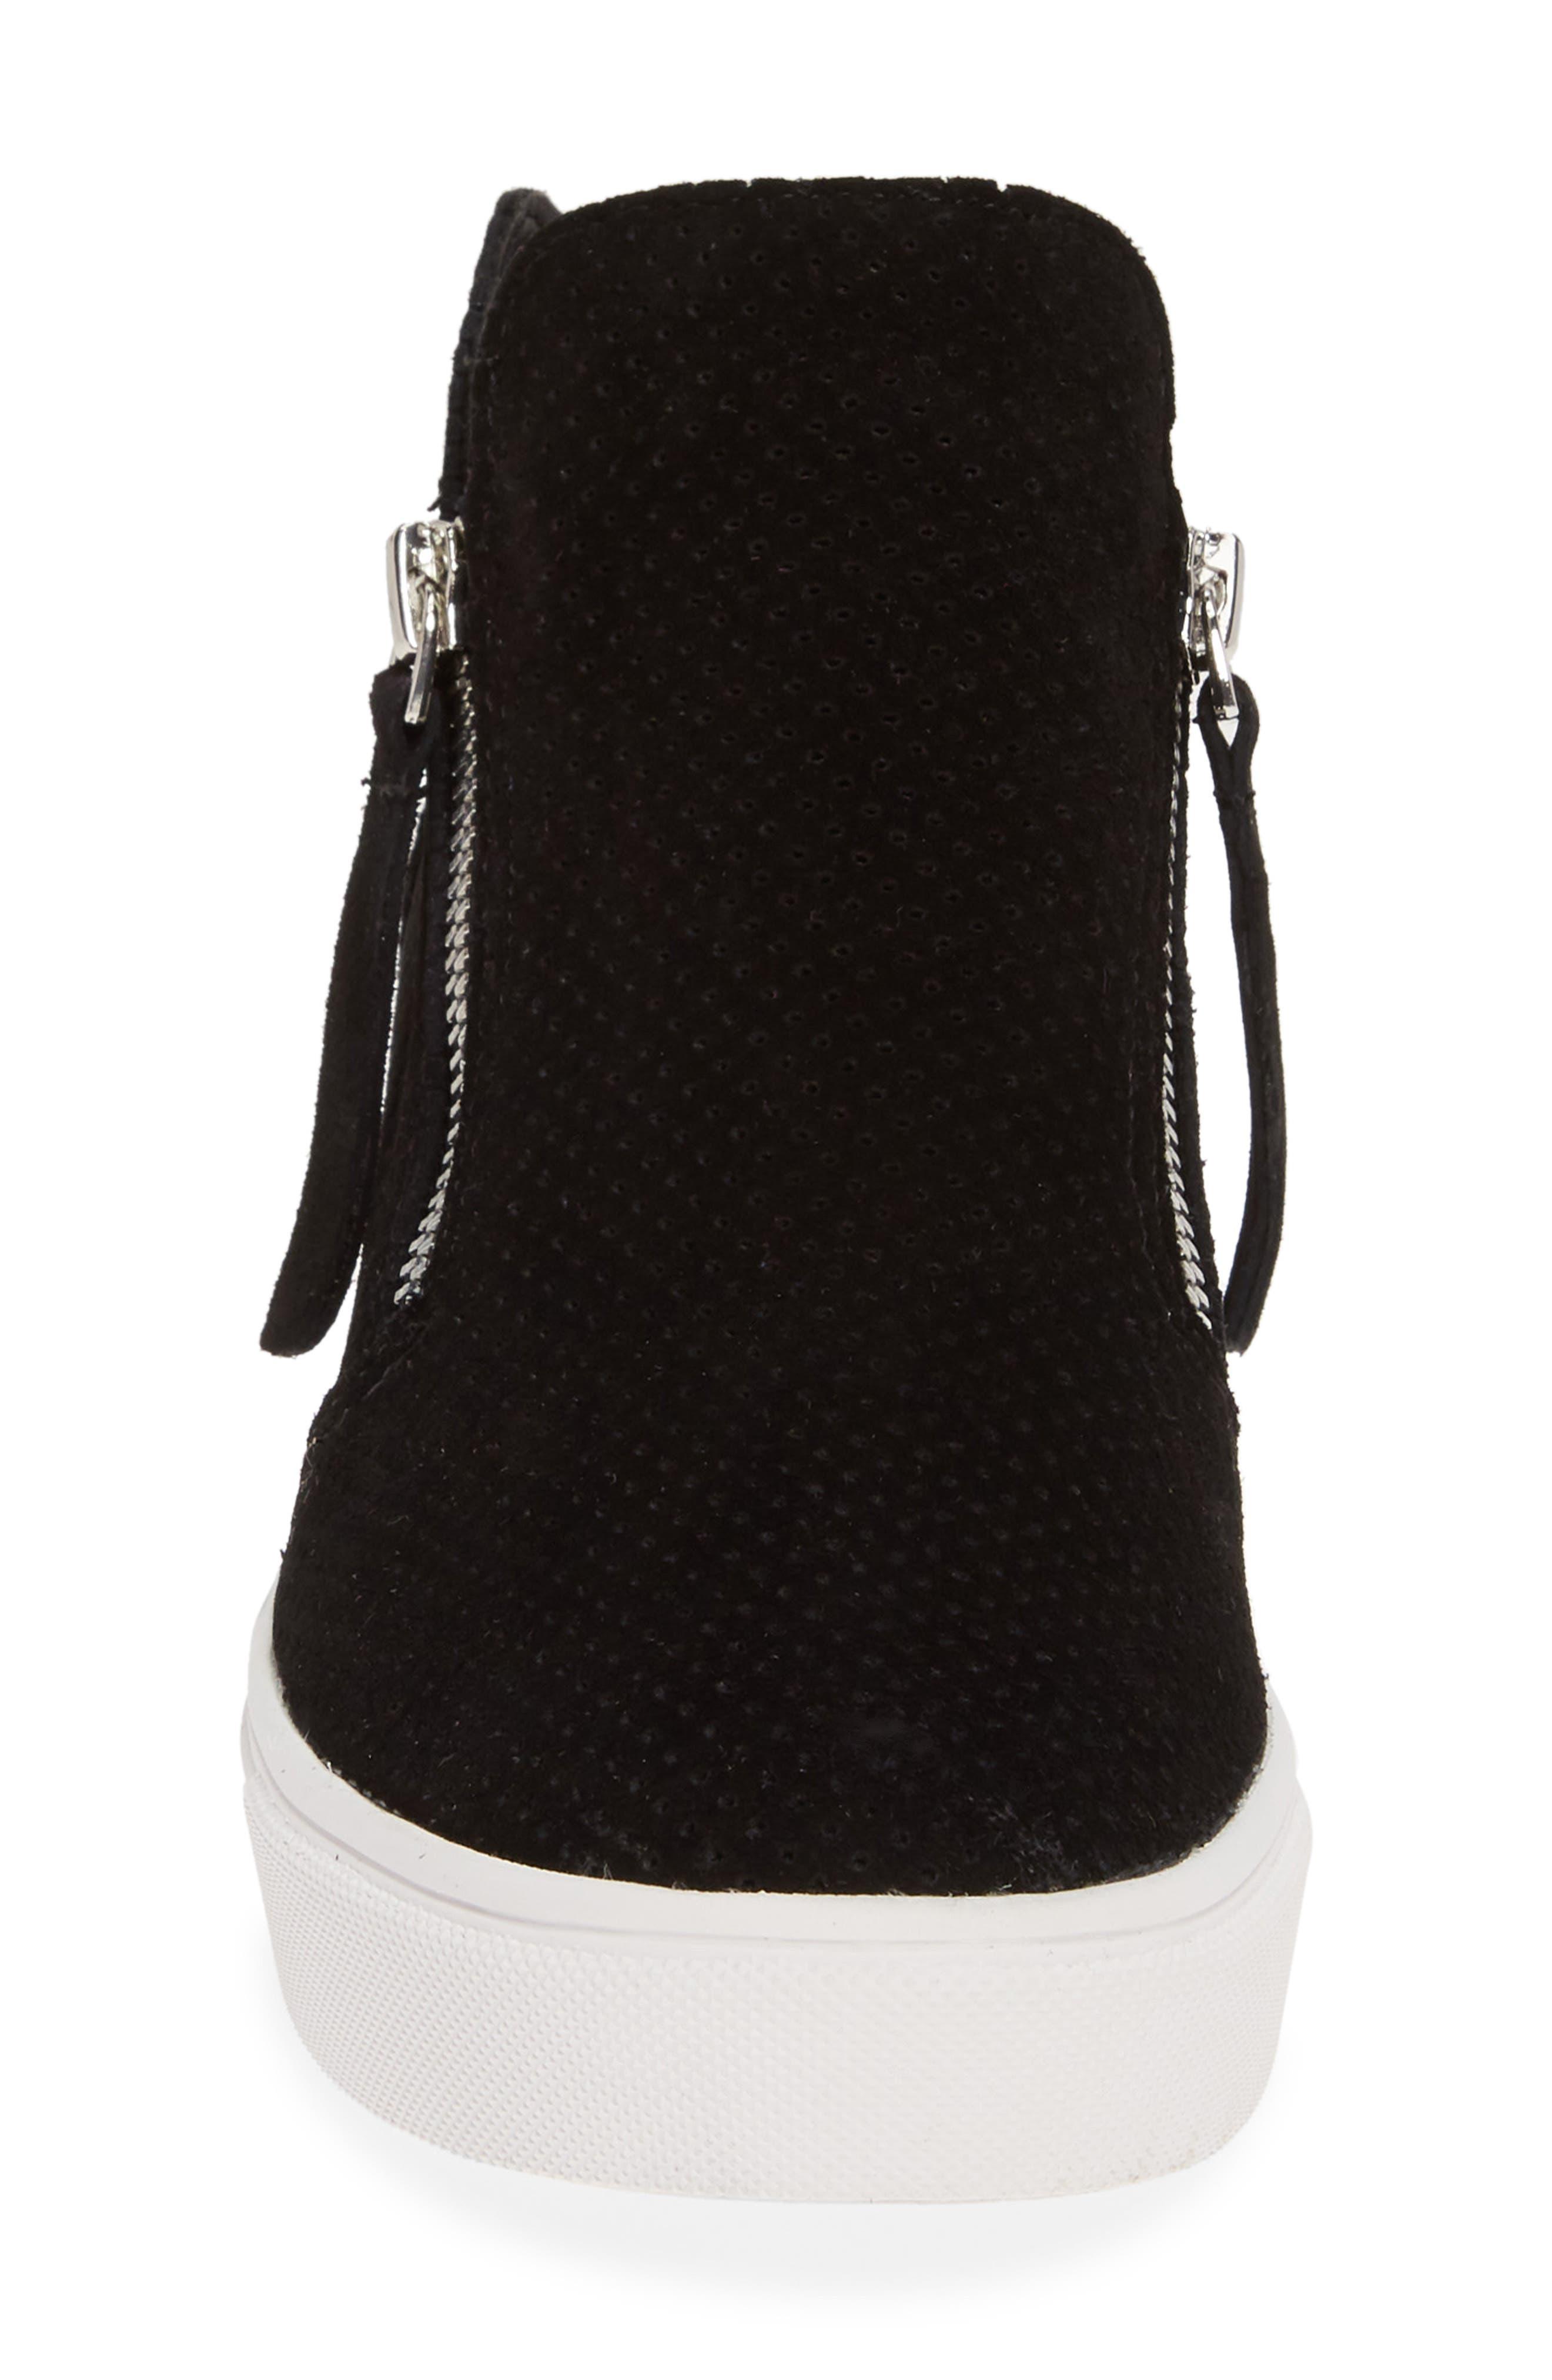 STEVE MADDEN,                             Caliber High Top Sneaker,                             Alternate thumbnail 4, color,                             BLACK SUEDE